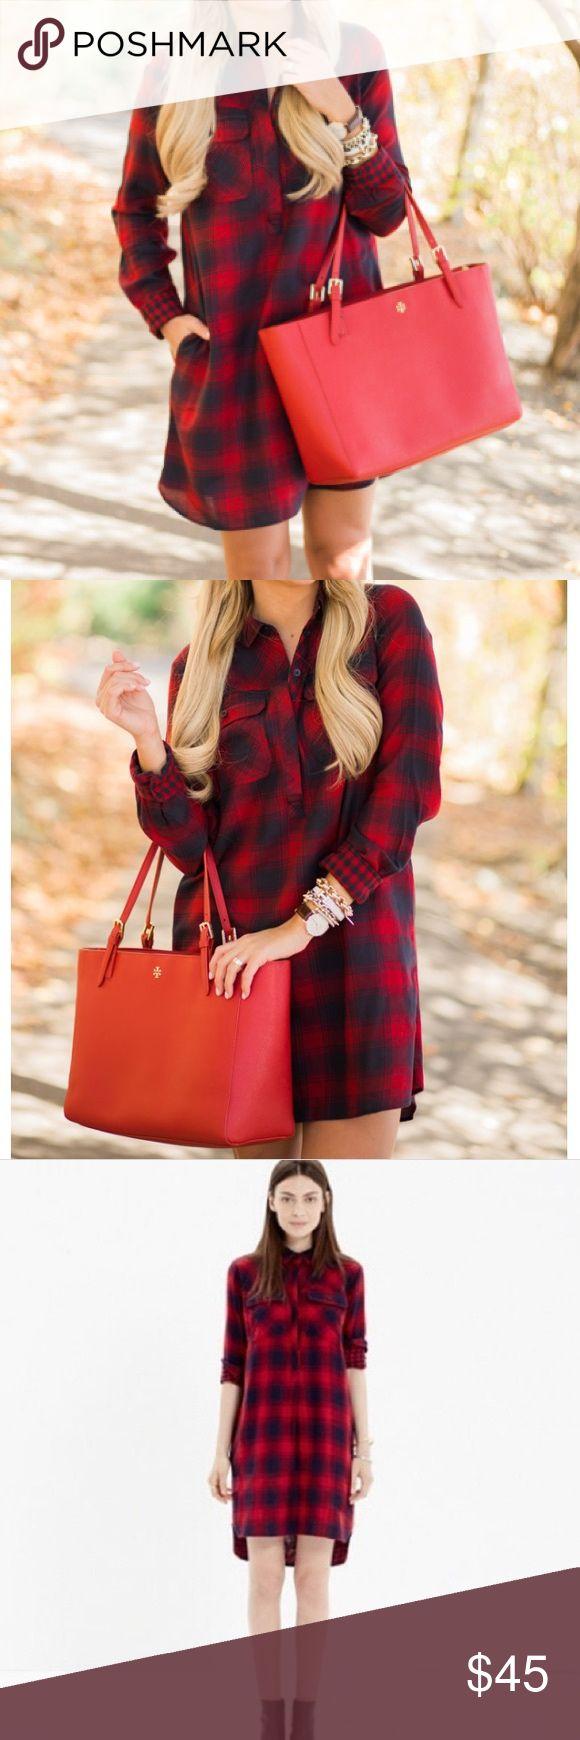 J. Crew • Plaid flannel shirt dress J. Crew factory navy/red plaid flannel shirt dress. Size XXS. Breast pocket detail. Good condition. J. Crew Dresses Mini